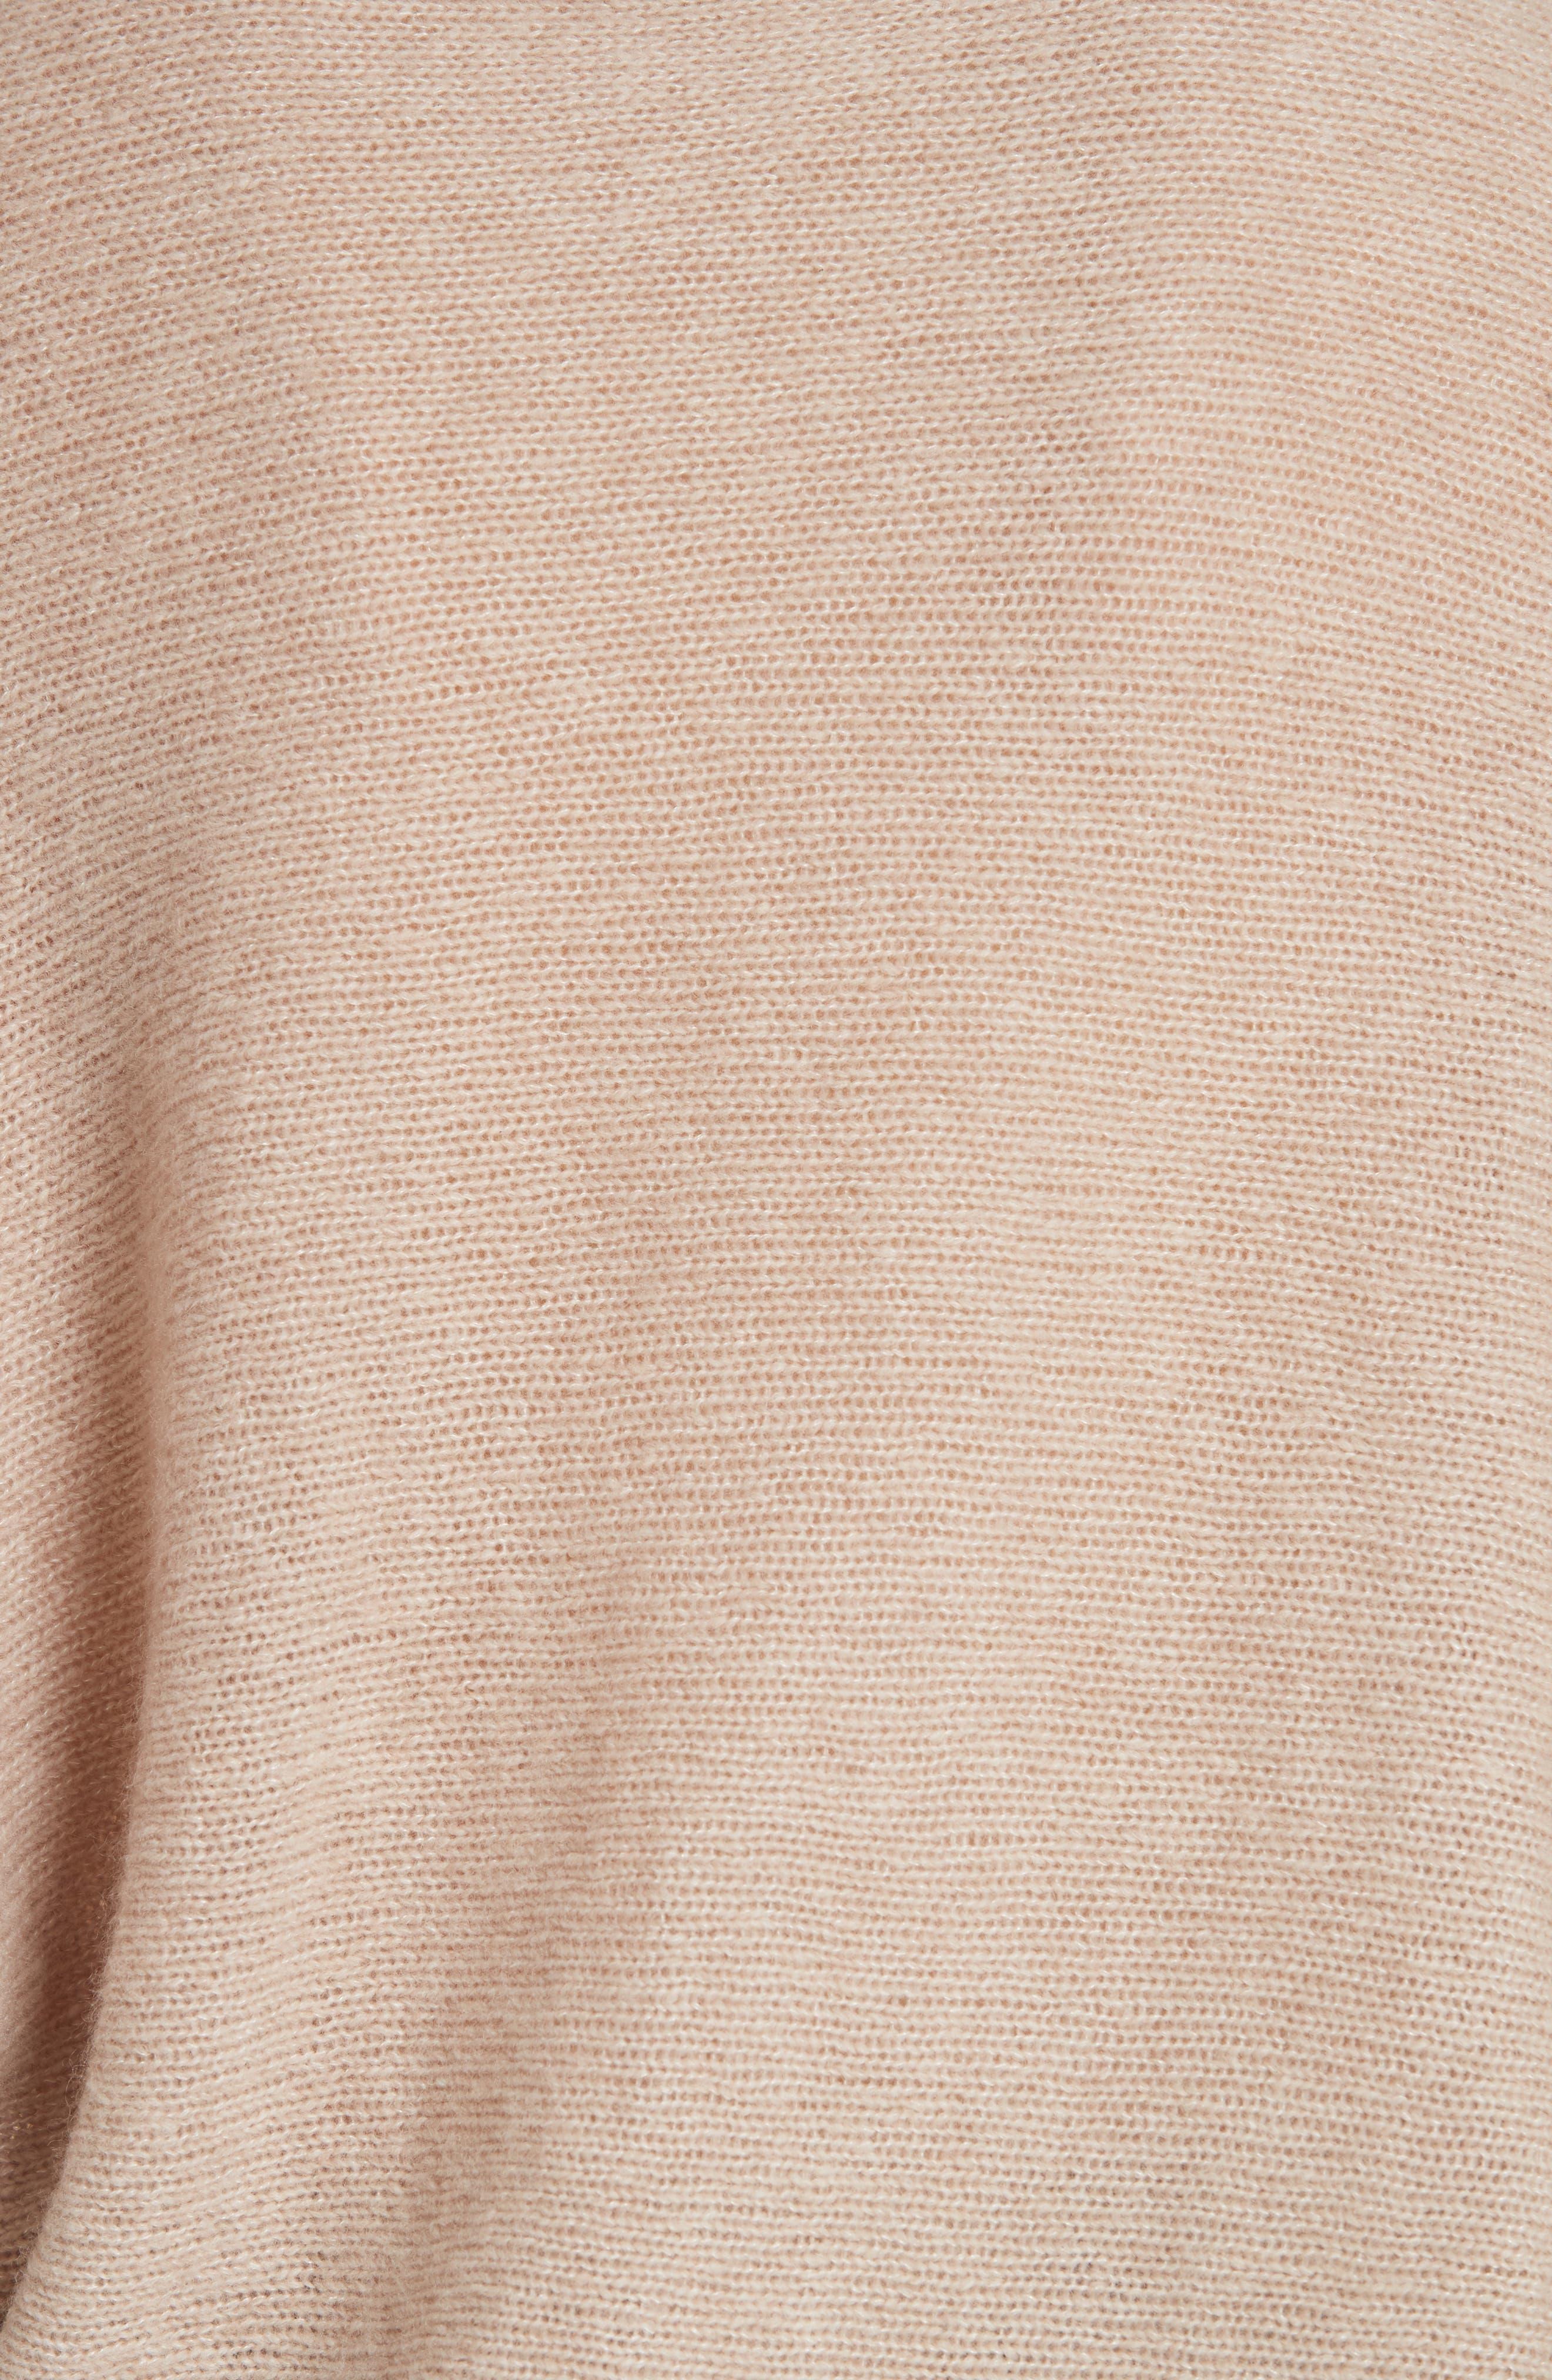 Cashmere Blend Dolman Sweater,                             Alternate thumbnail 5, color,                             250